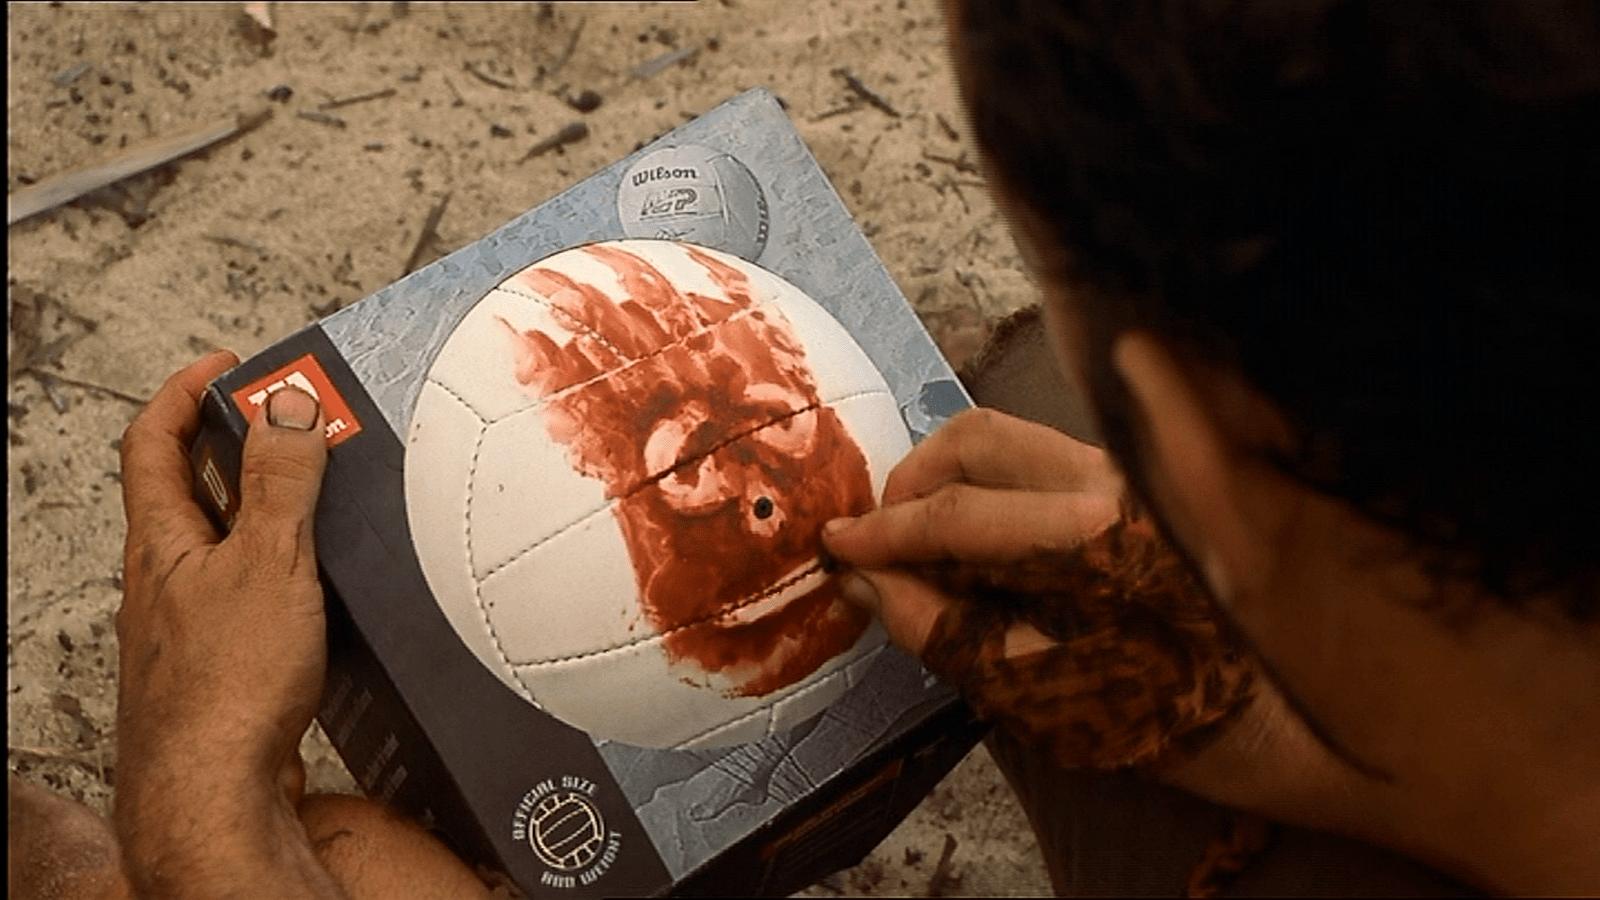 Nasce Wilson.